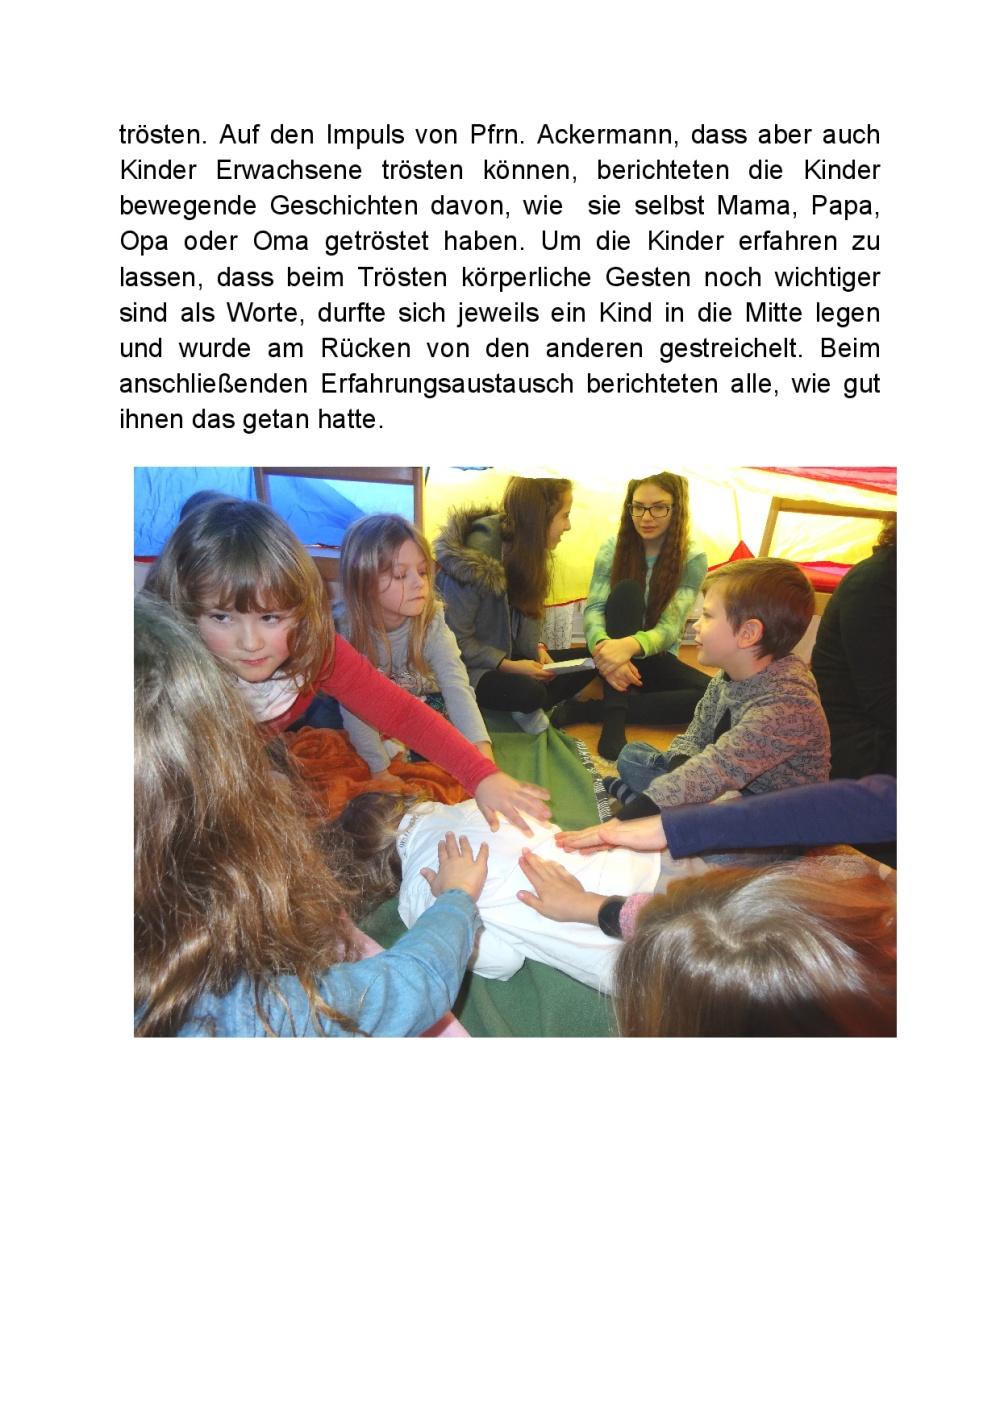 2016-01-17-mit-kindersekt-ins-neue-kigo-jahr-002